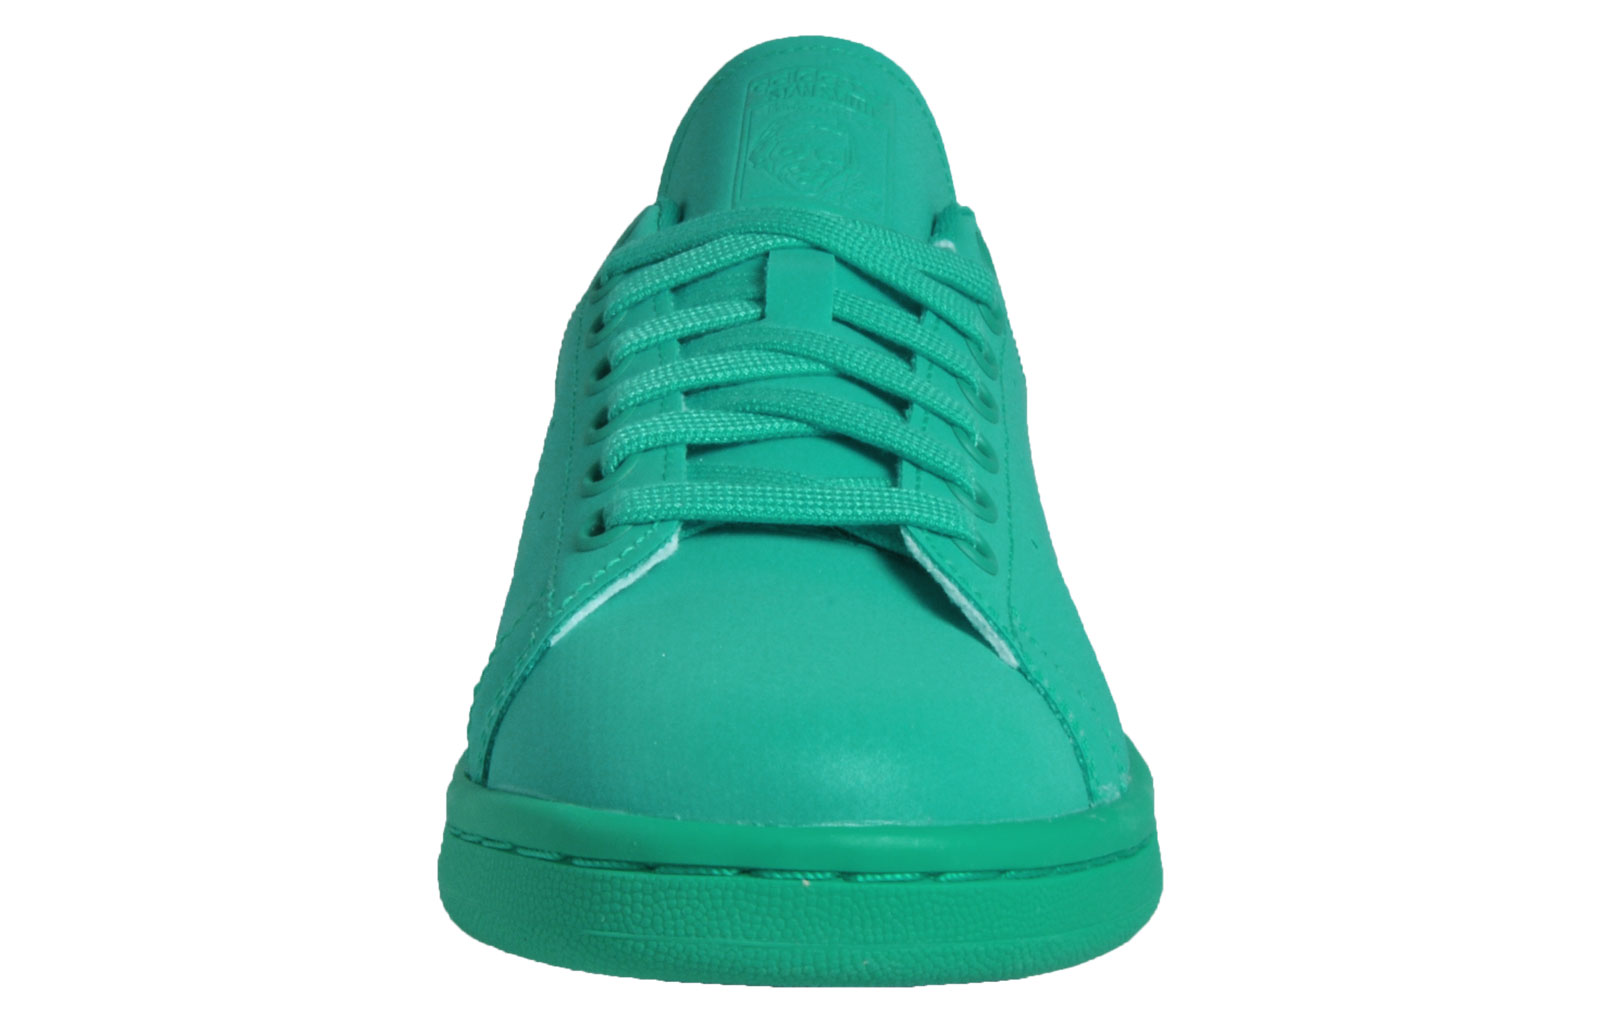 buy popular 1f568 a2b57 Adidas Stan Smith Adicolor Uni Classic Casual Retro Trainers Mint